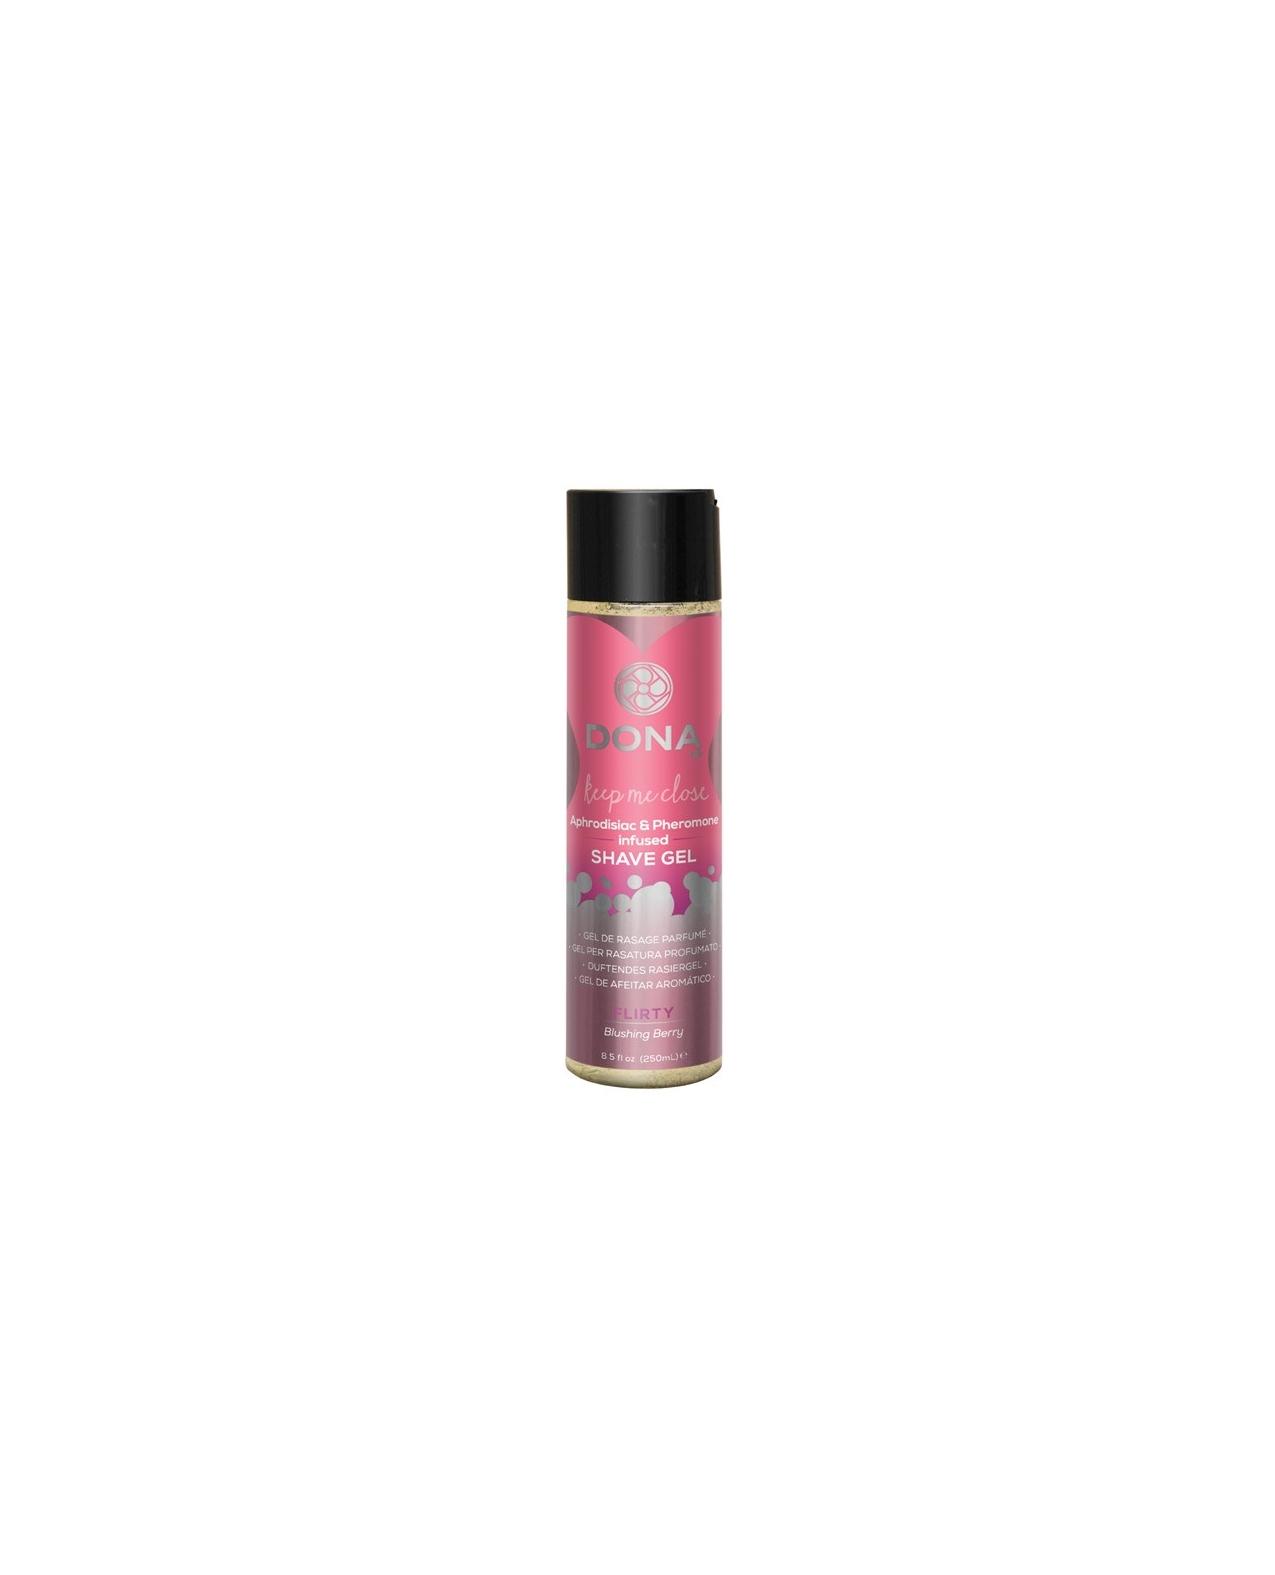 Dona Shave Gel Flirty - 8 oz Blushing Berry